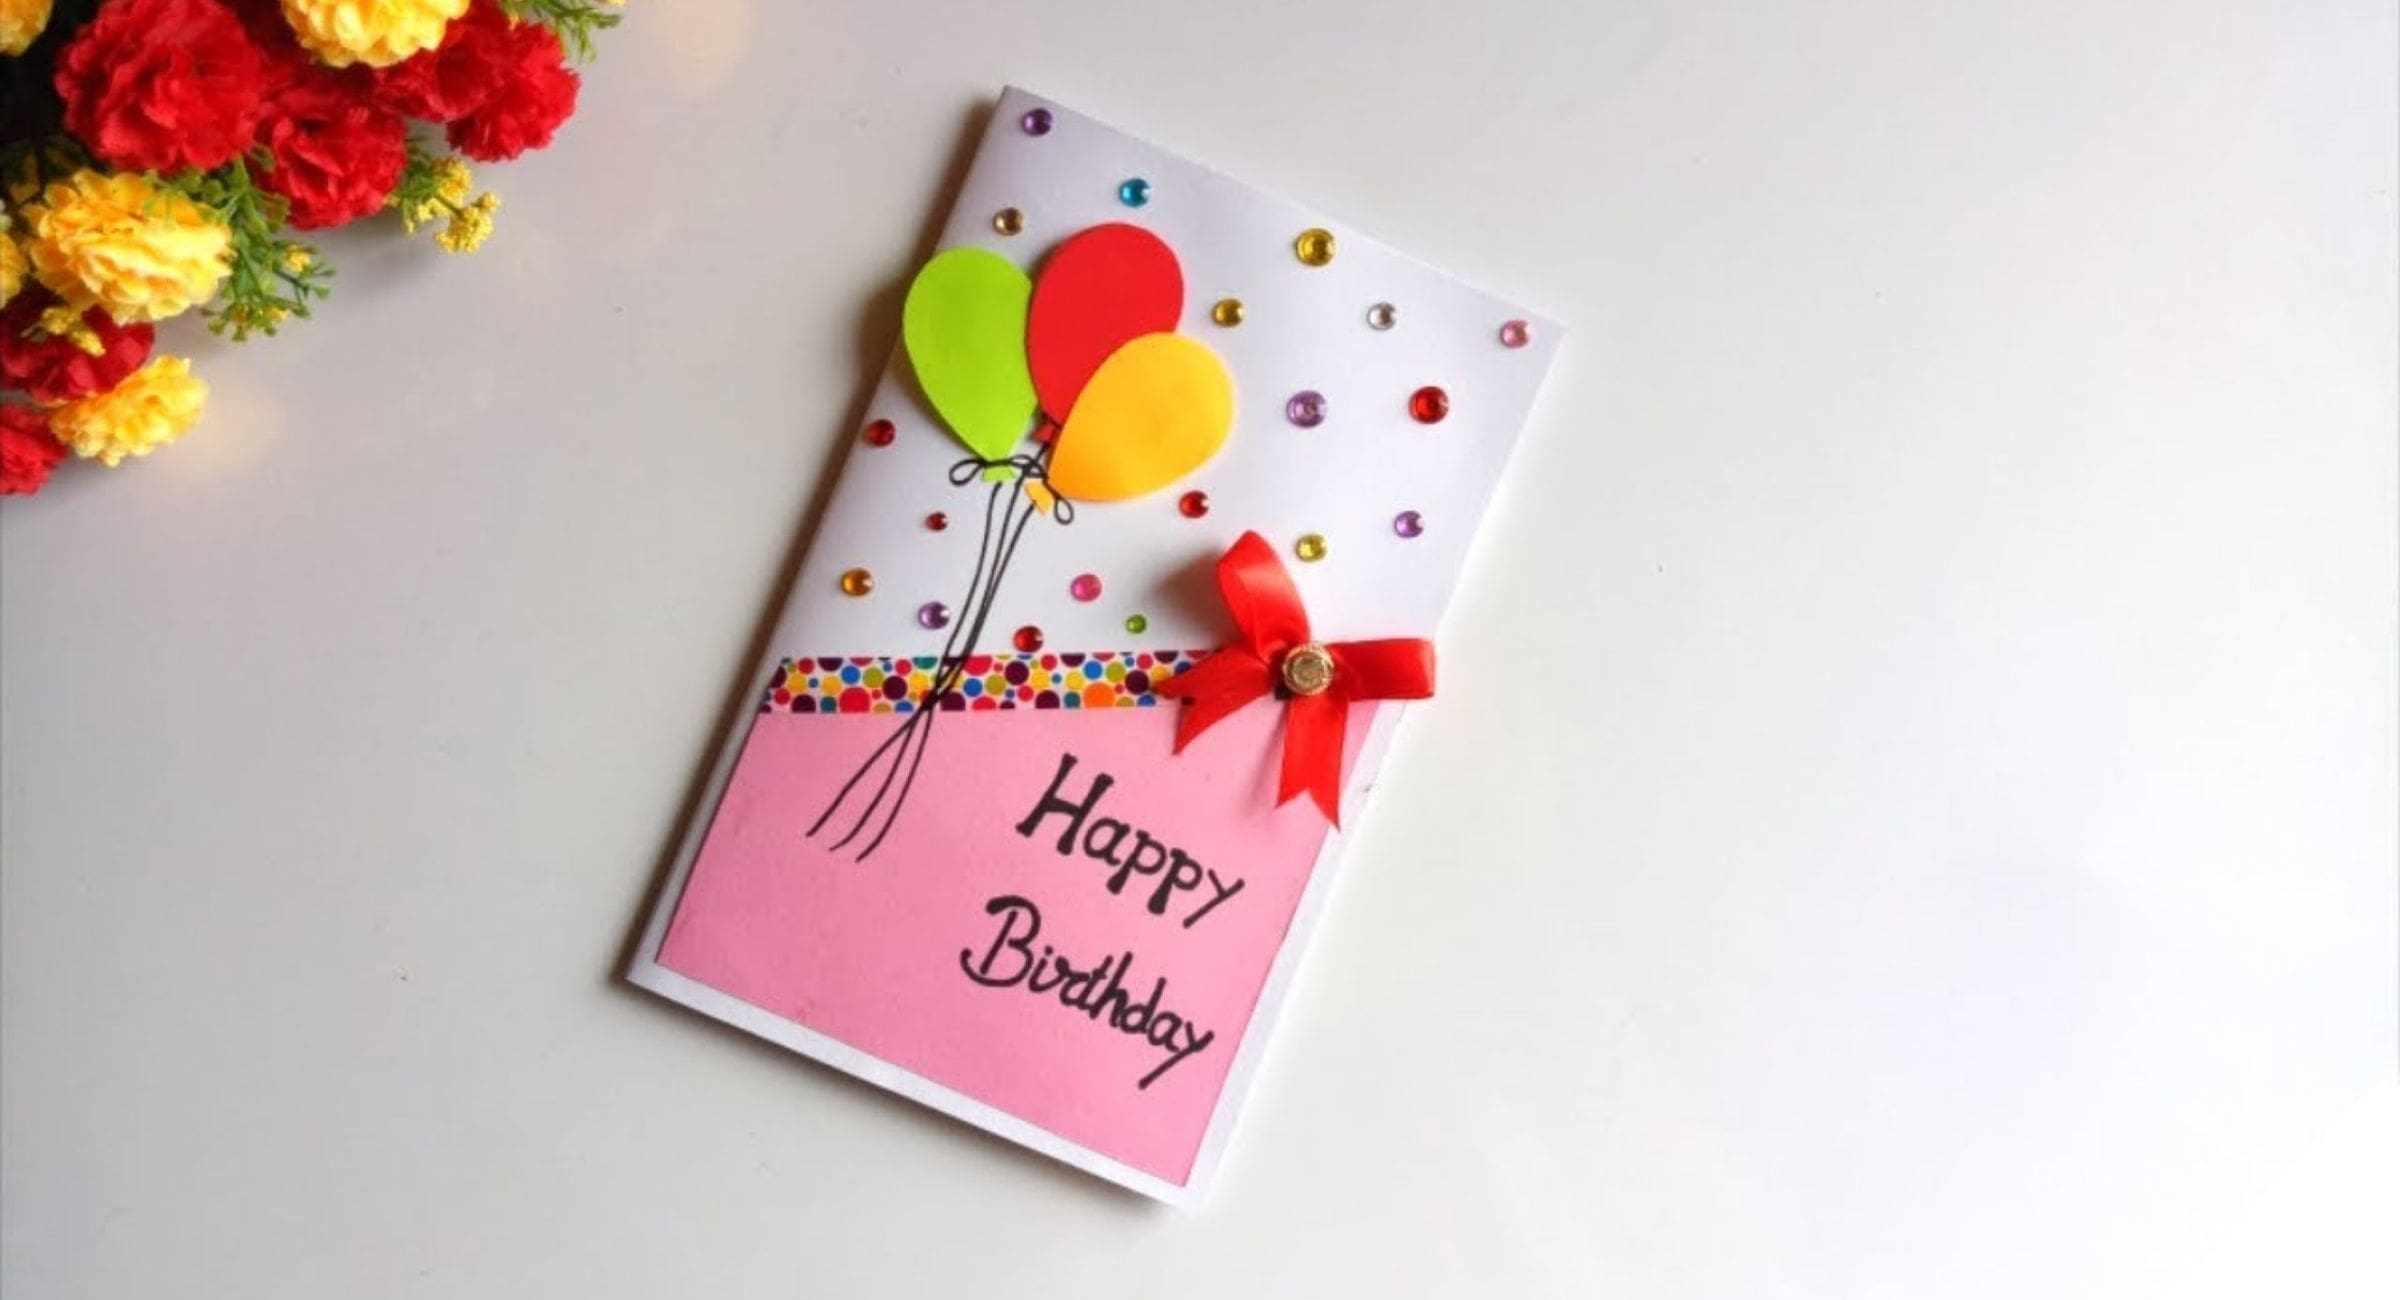 A special birthday card